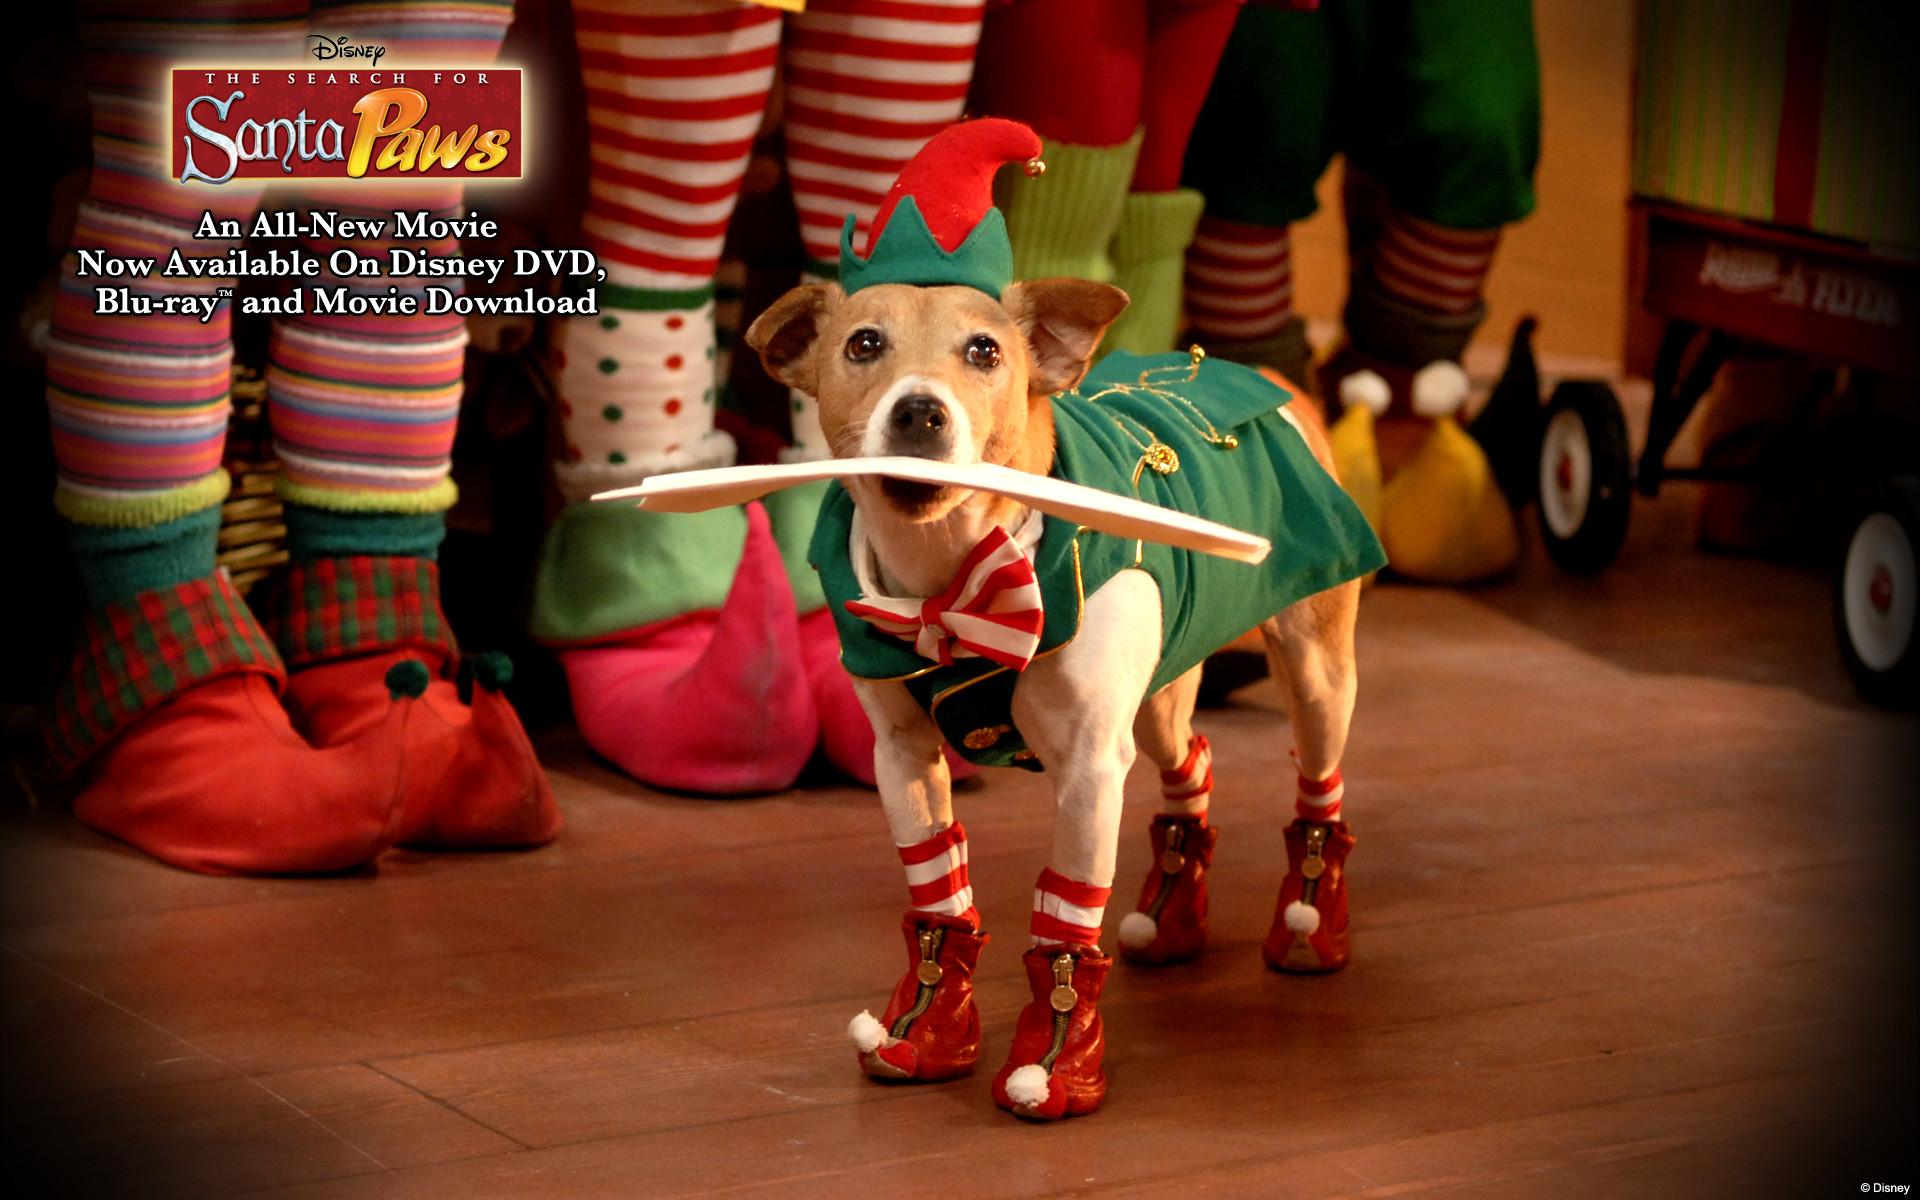 Cute Merry Christmas Wallpaper Dogs Christmas Dog Wallpaper 183 ① Wallpapertag